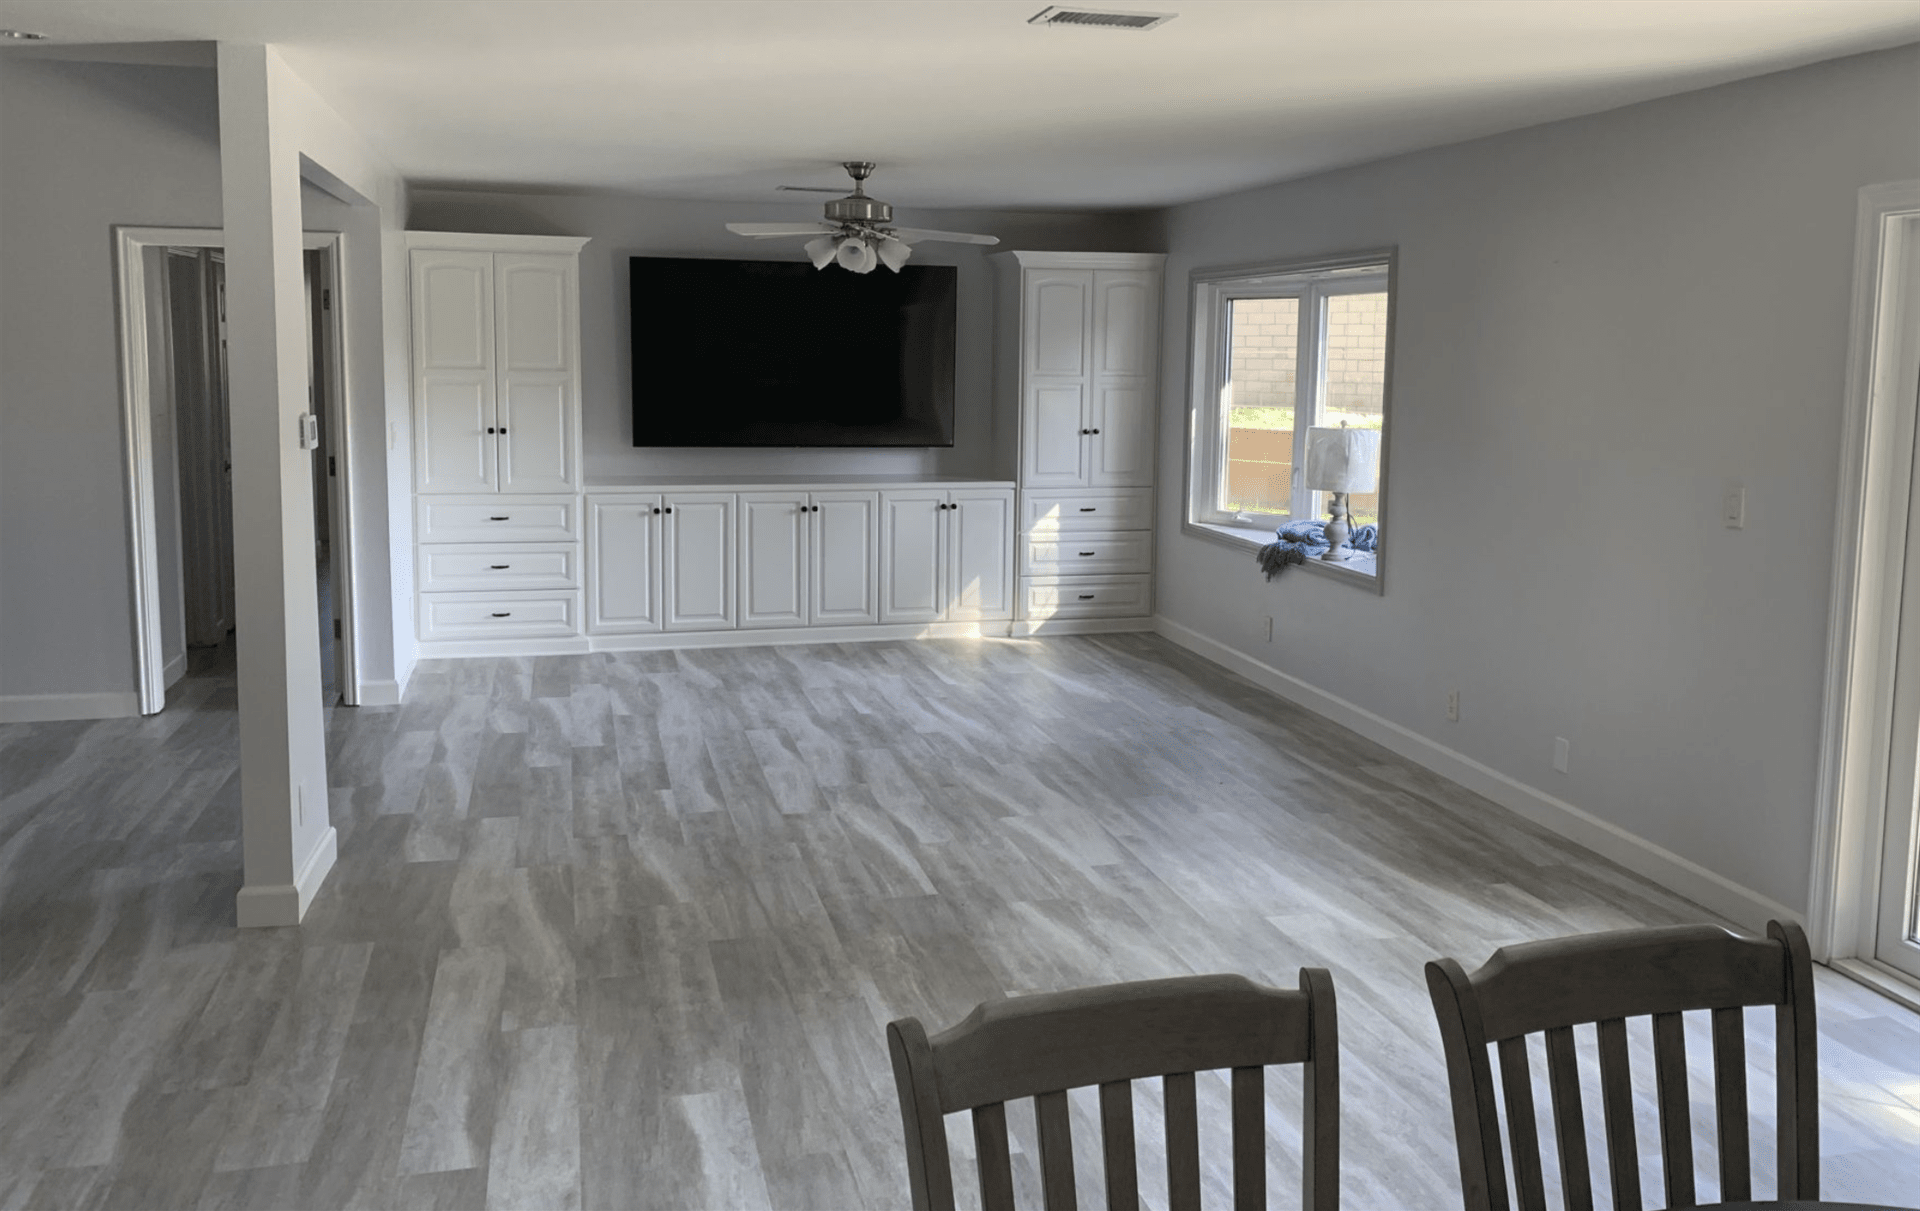 Vinyl plank flooring in Placentia, CA from TS Home Design Center / Rite Loom Flooring